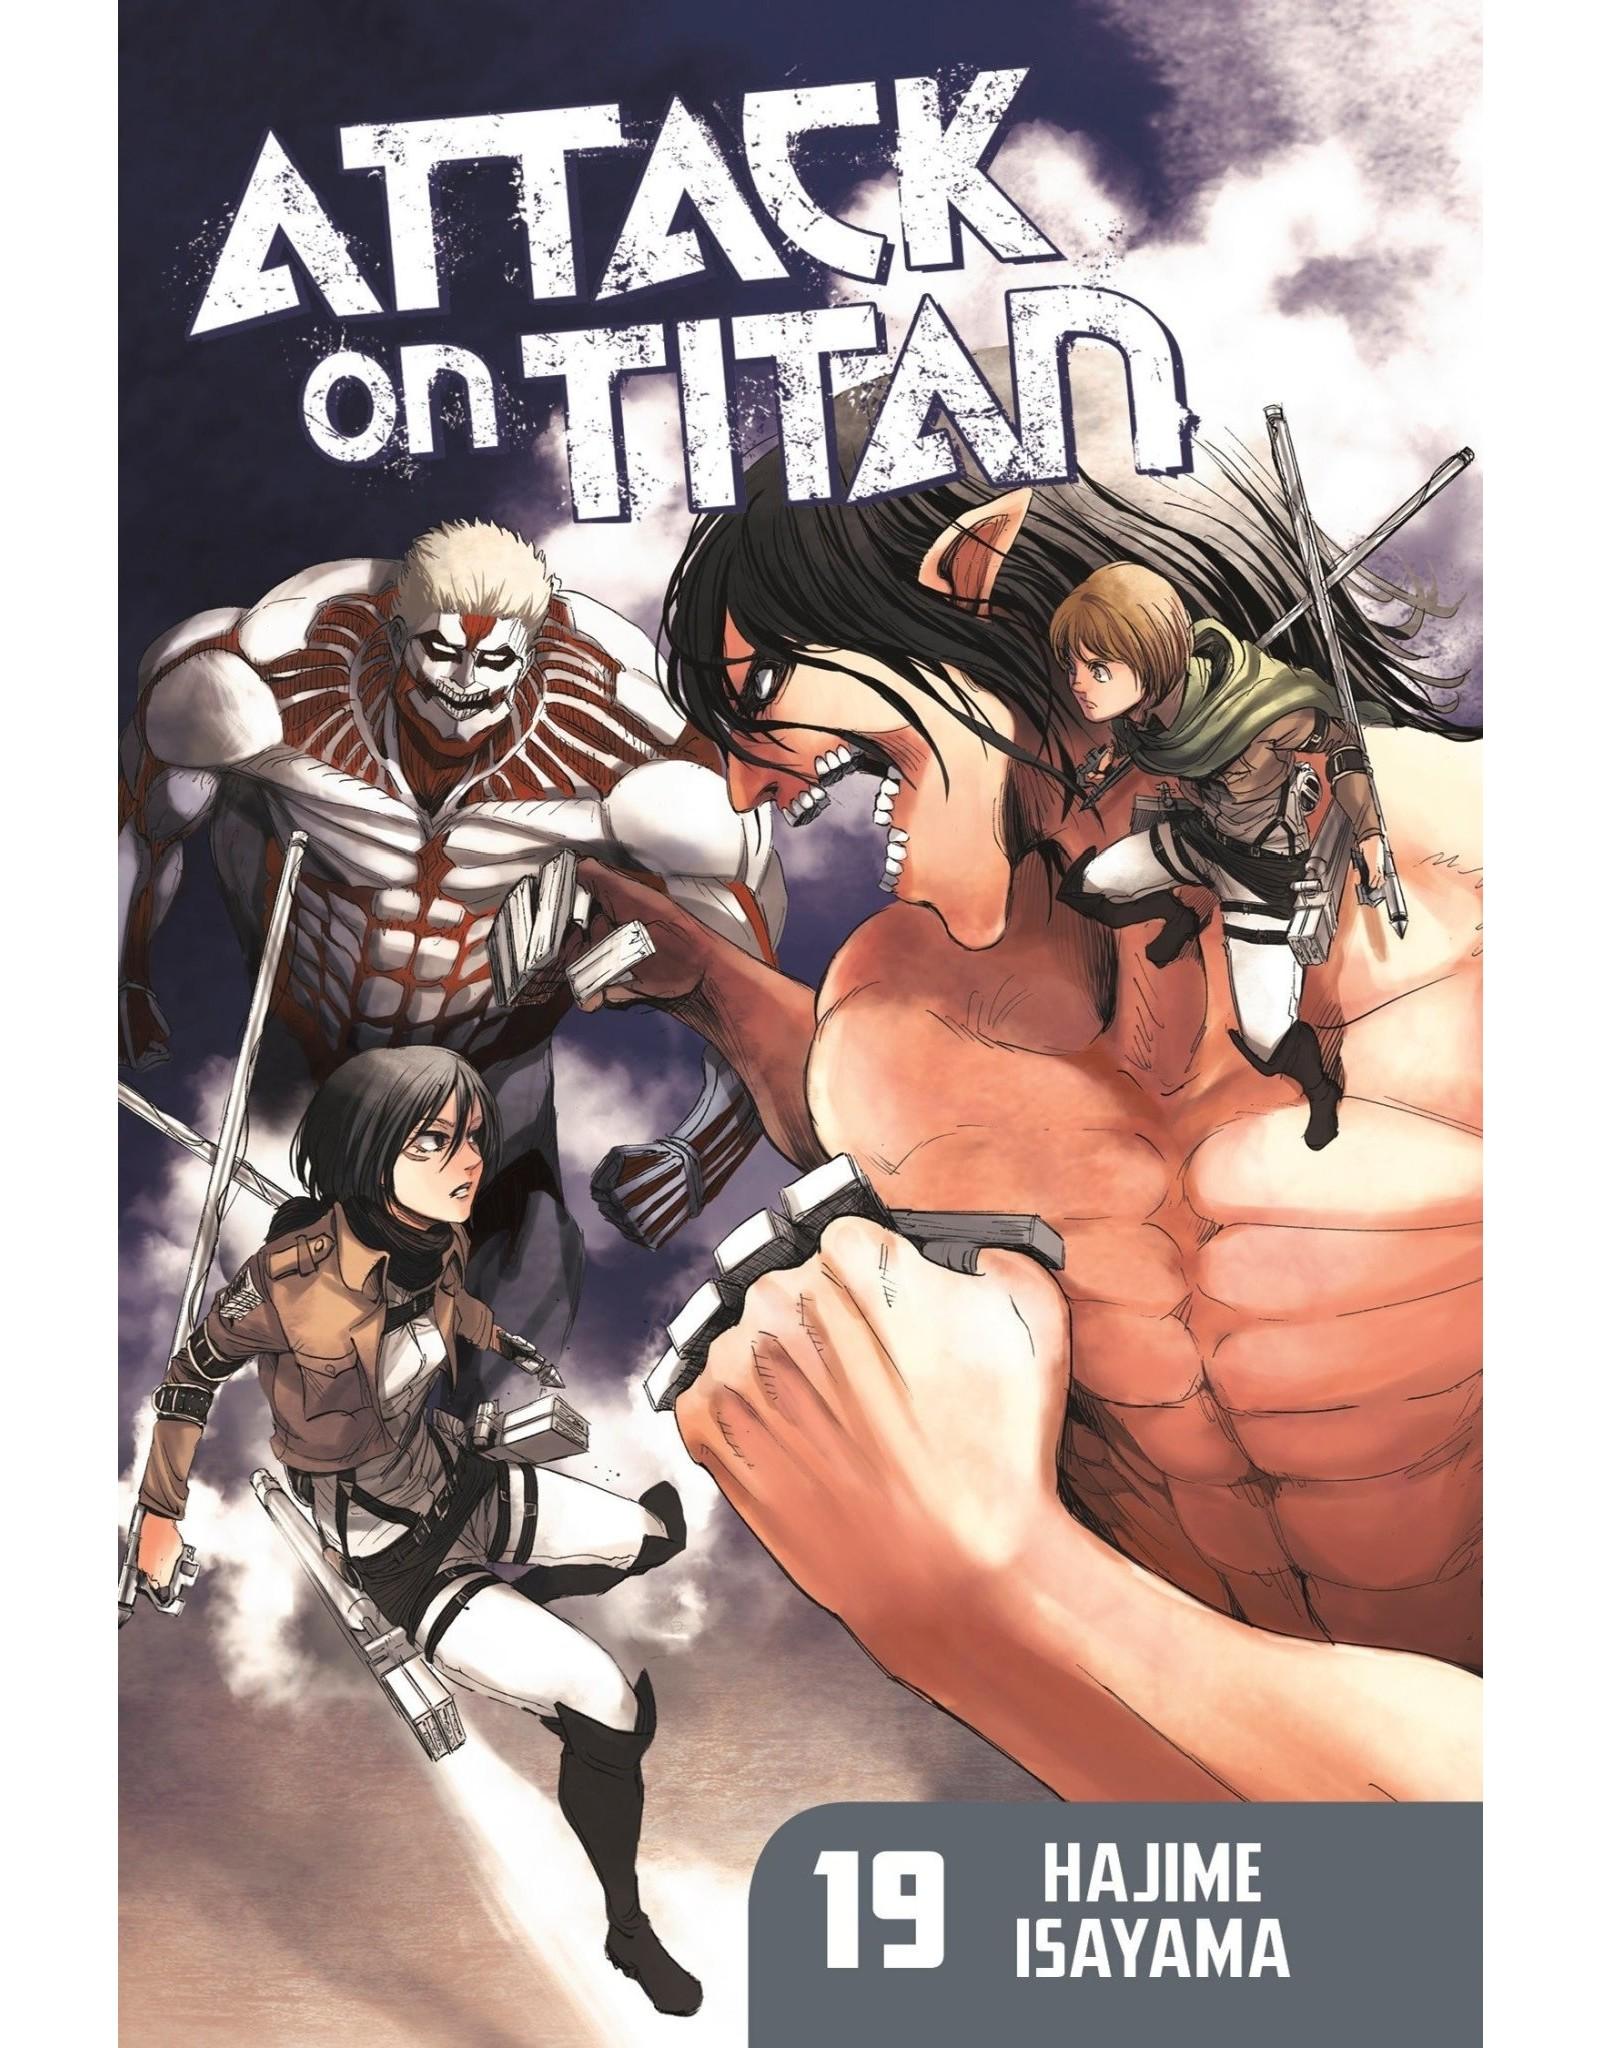 Attack on Titan 19 (English Version)